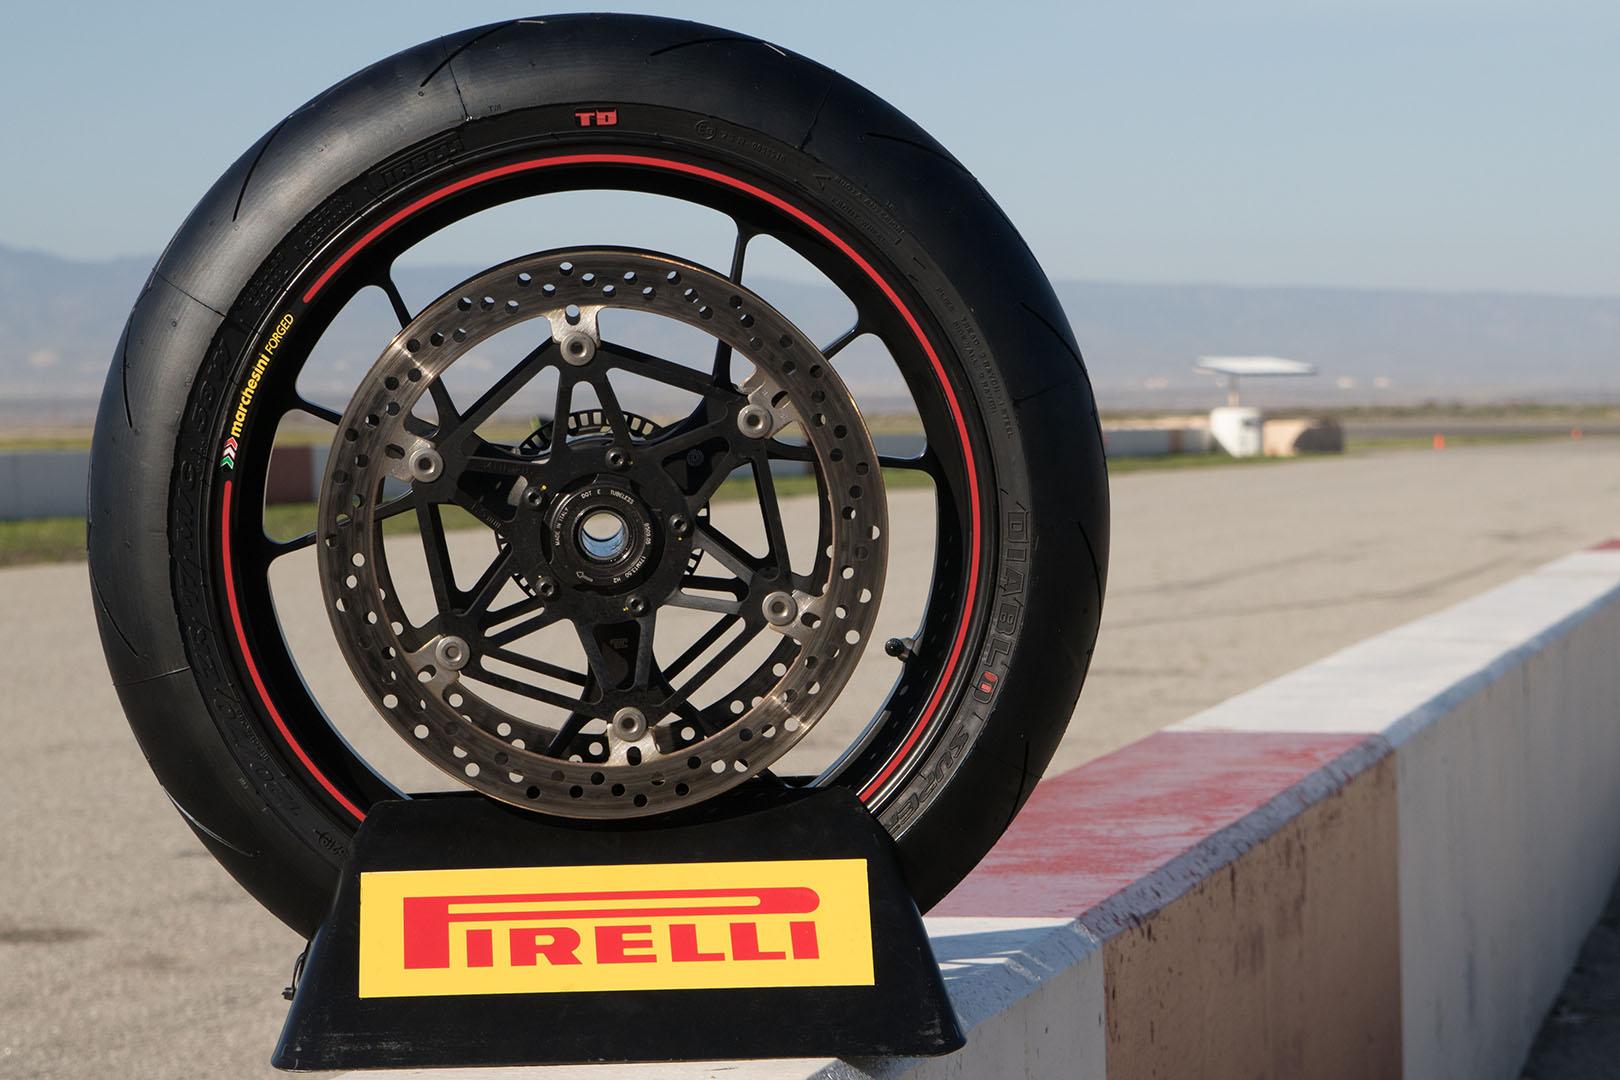 Pirelli Diablo Supercorsa TD Track Tire - pit wall